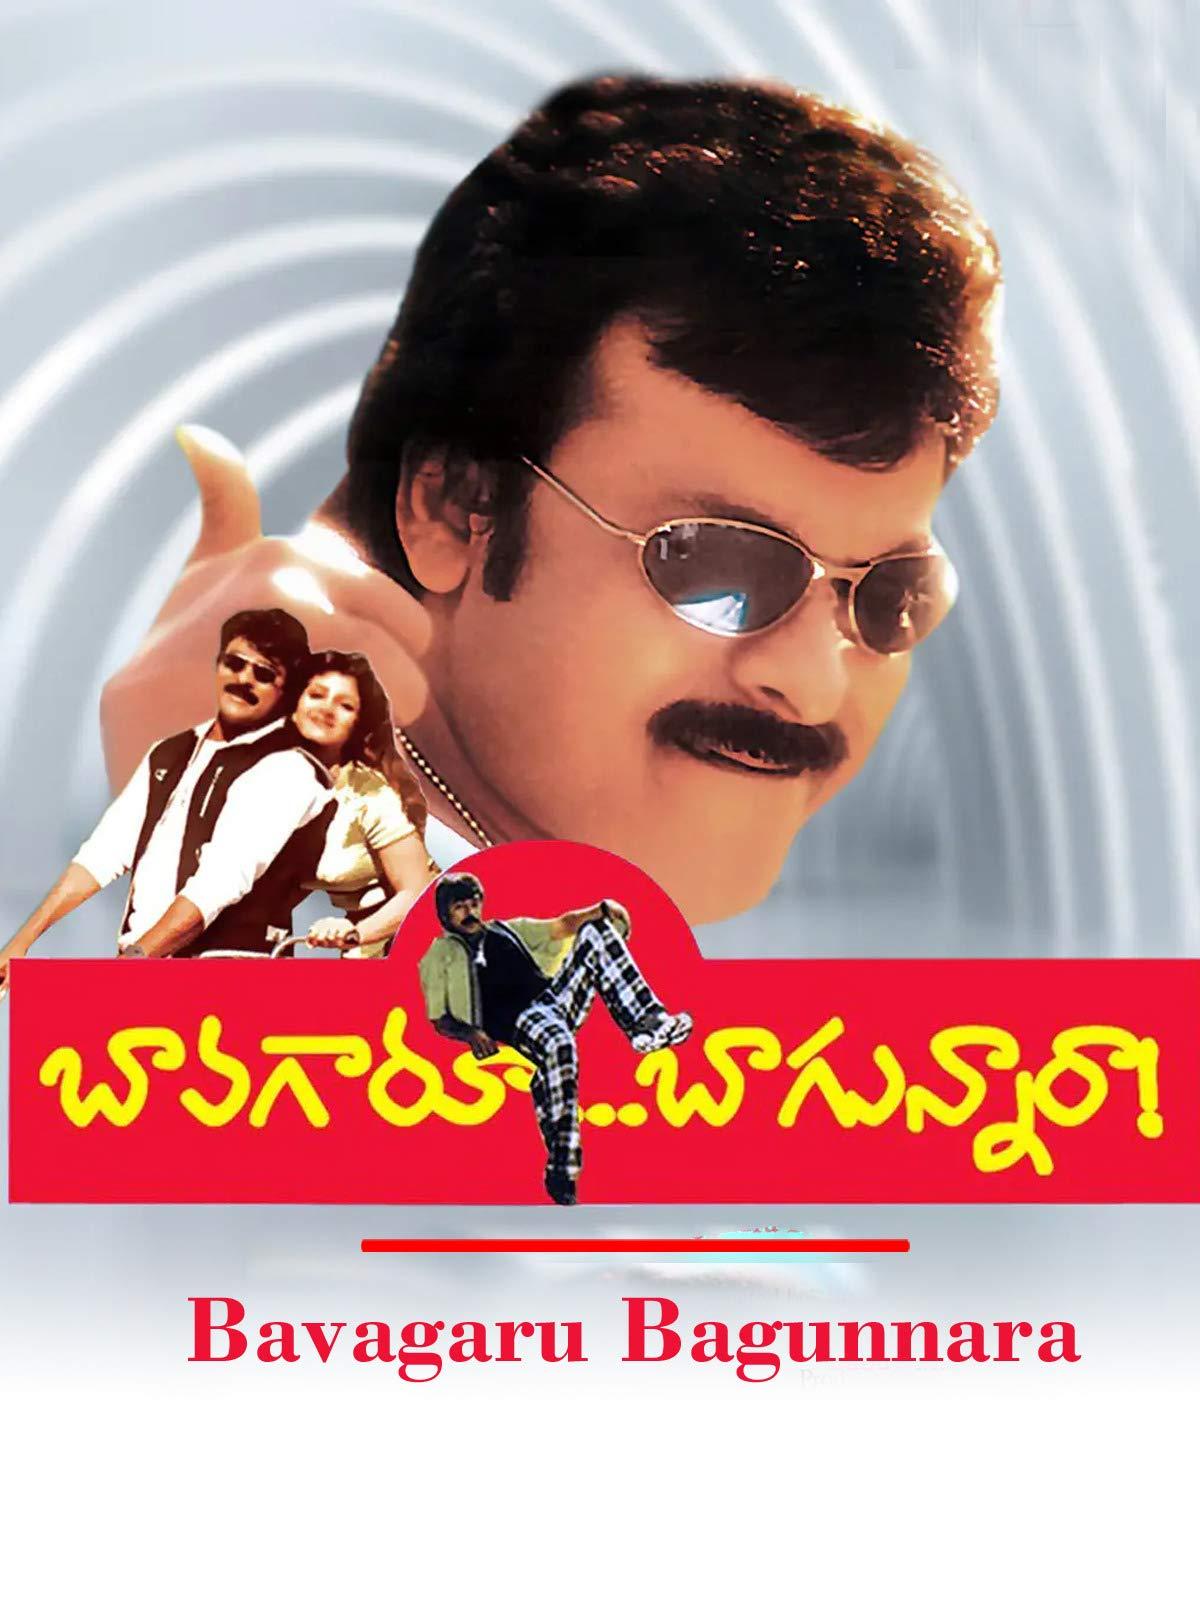 Bavagaru Bagunnara